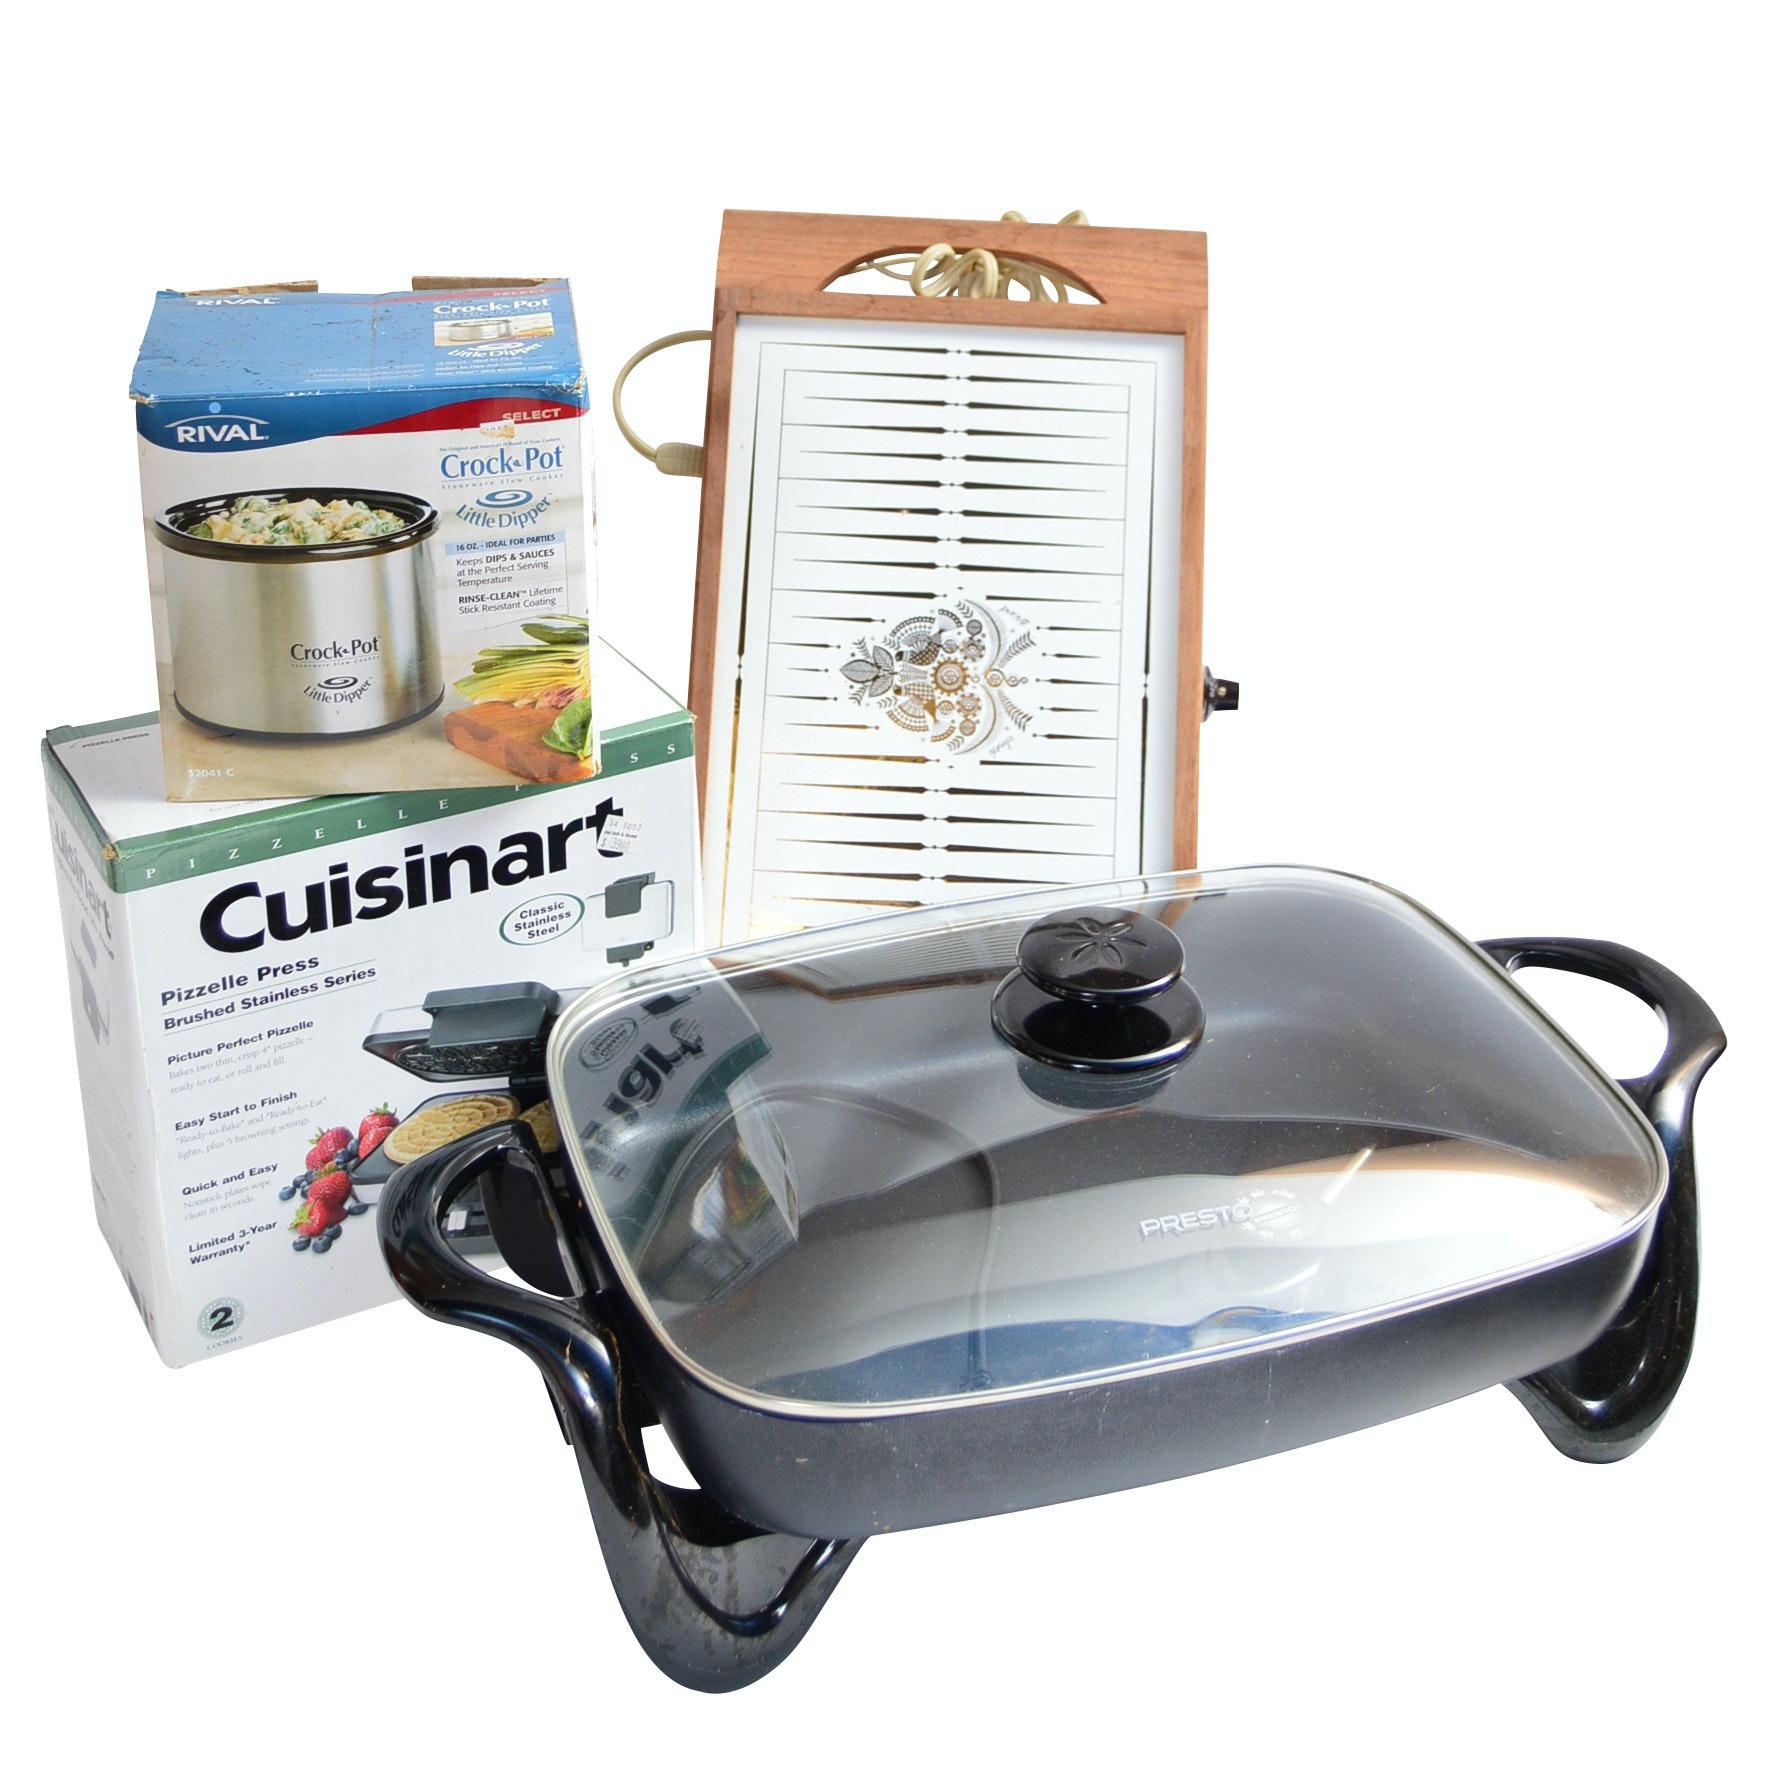 Kitchen Appliances with Presto Skillet, Crock-Pot, Cuisinart and Briard Warmer